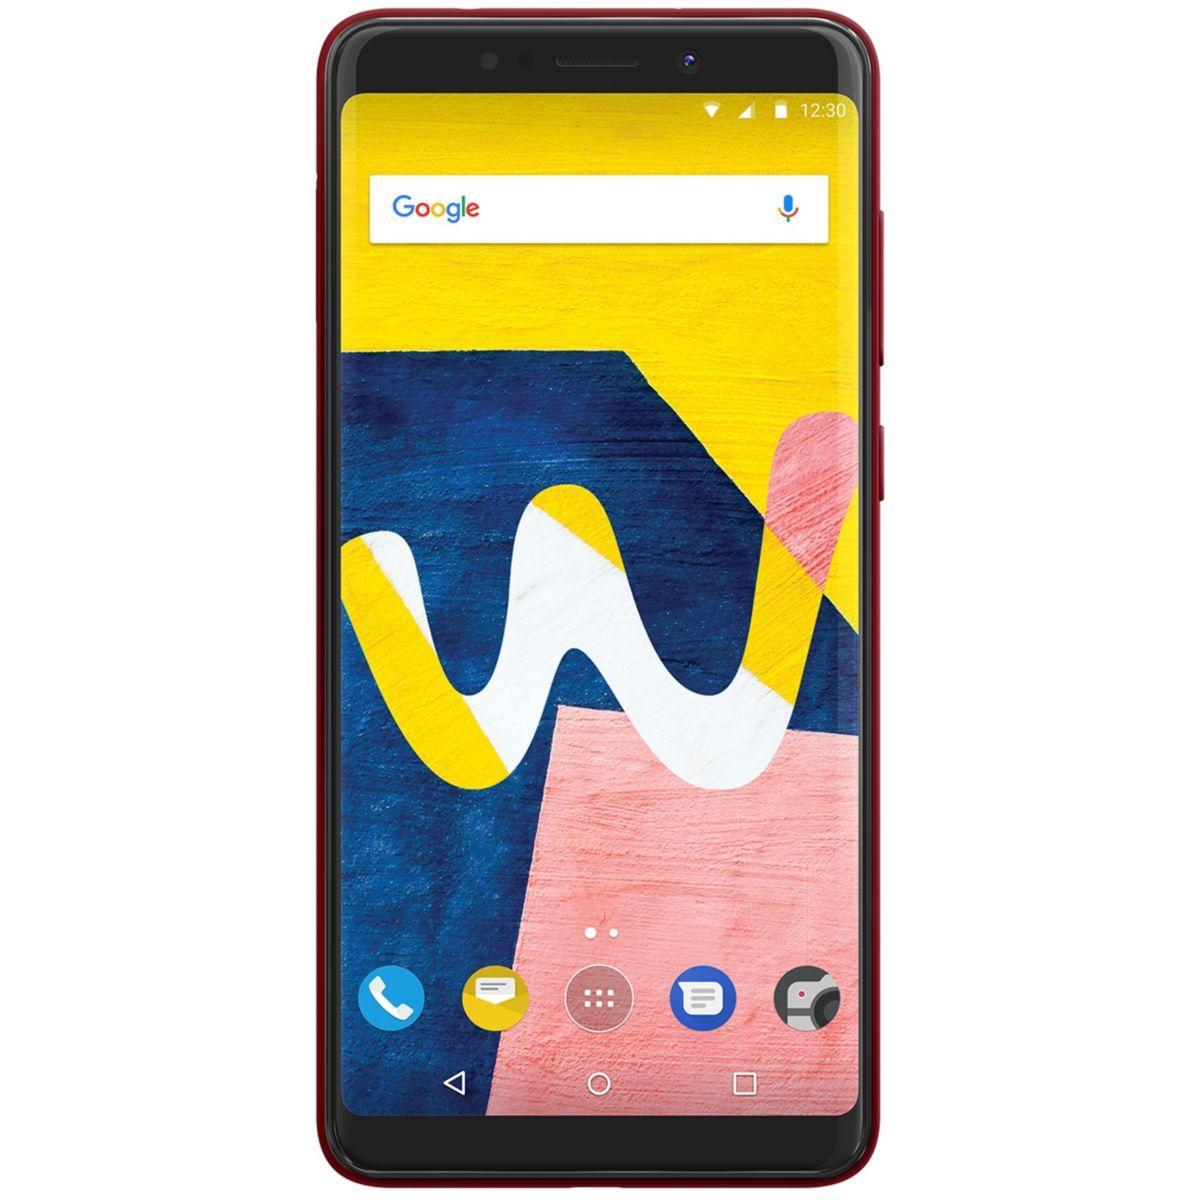 Smartphone wiko view lite 4g cherry red - 5% de remise imm�diate avec le code : fete5